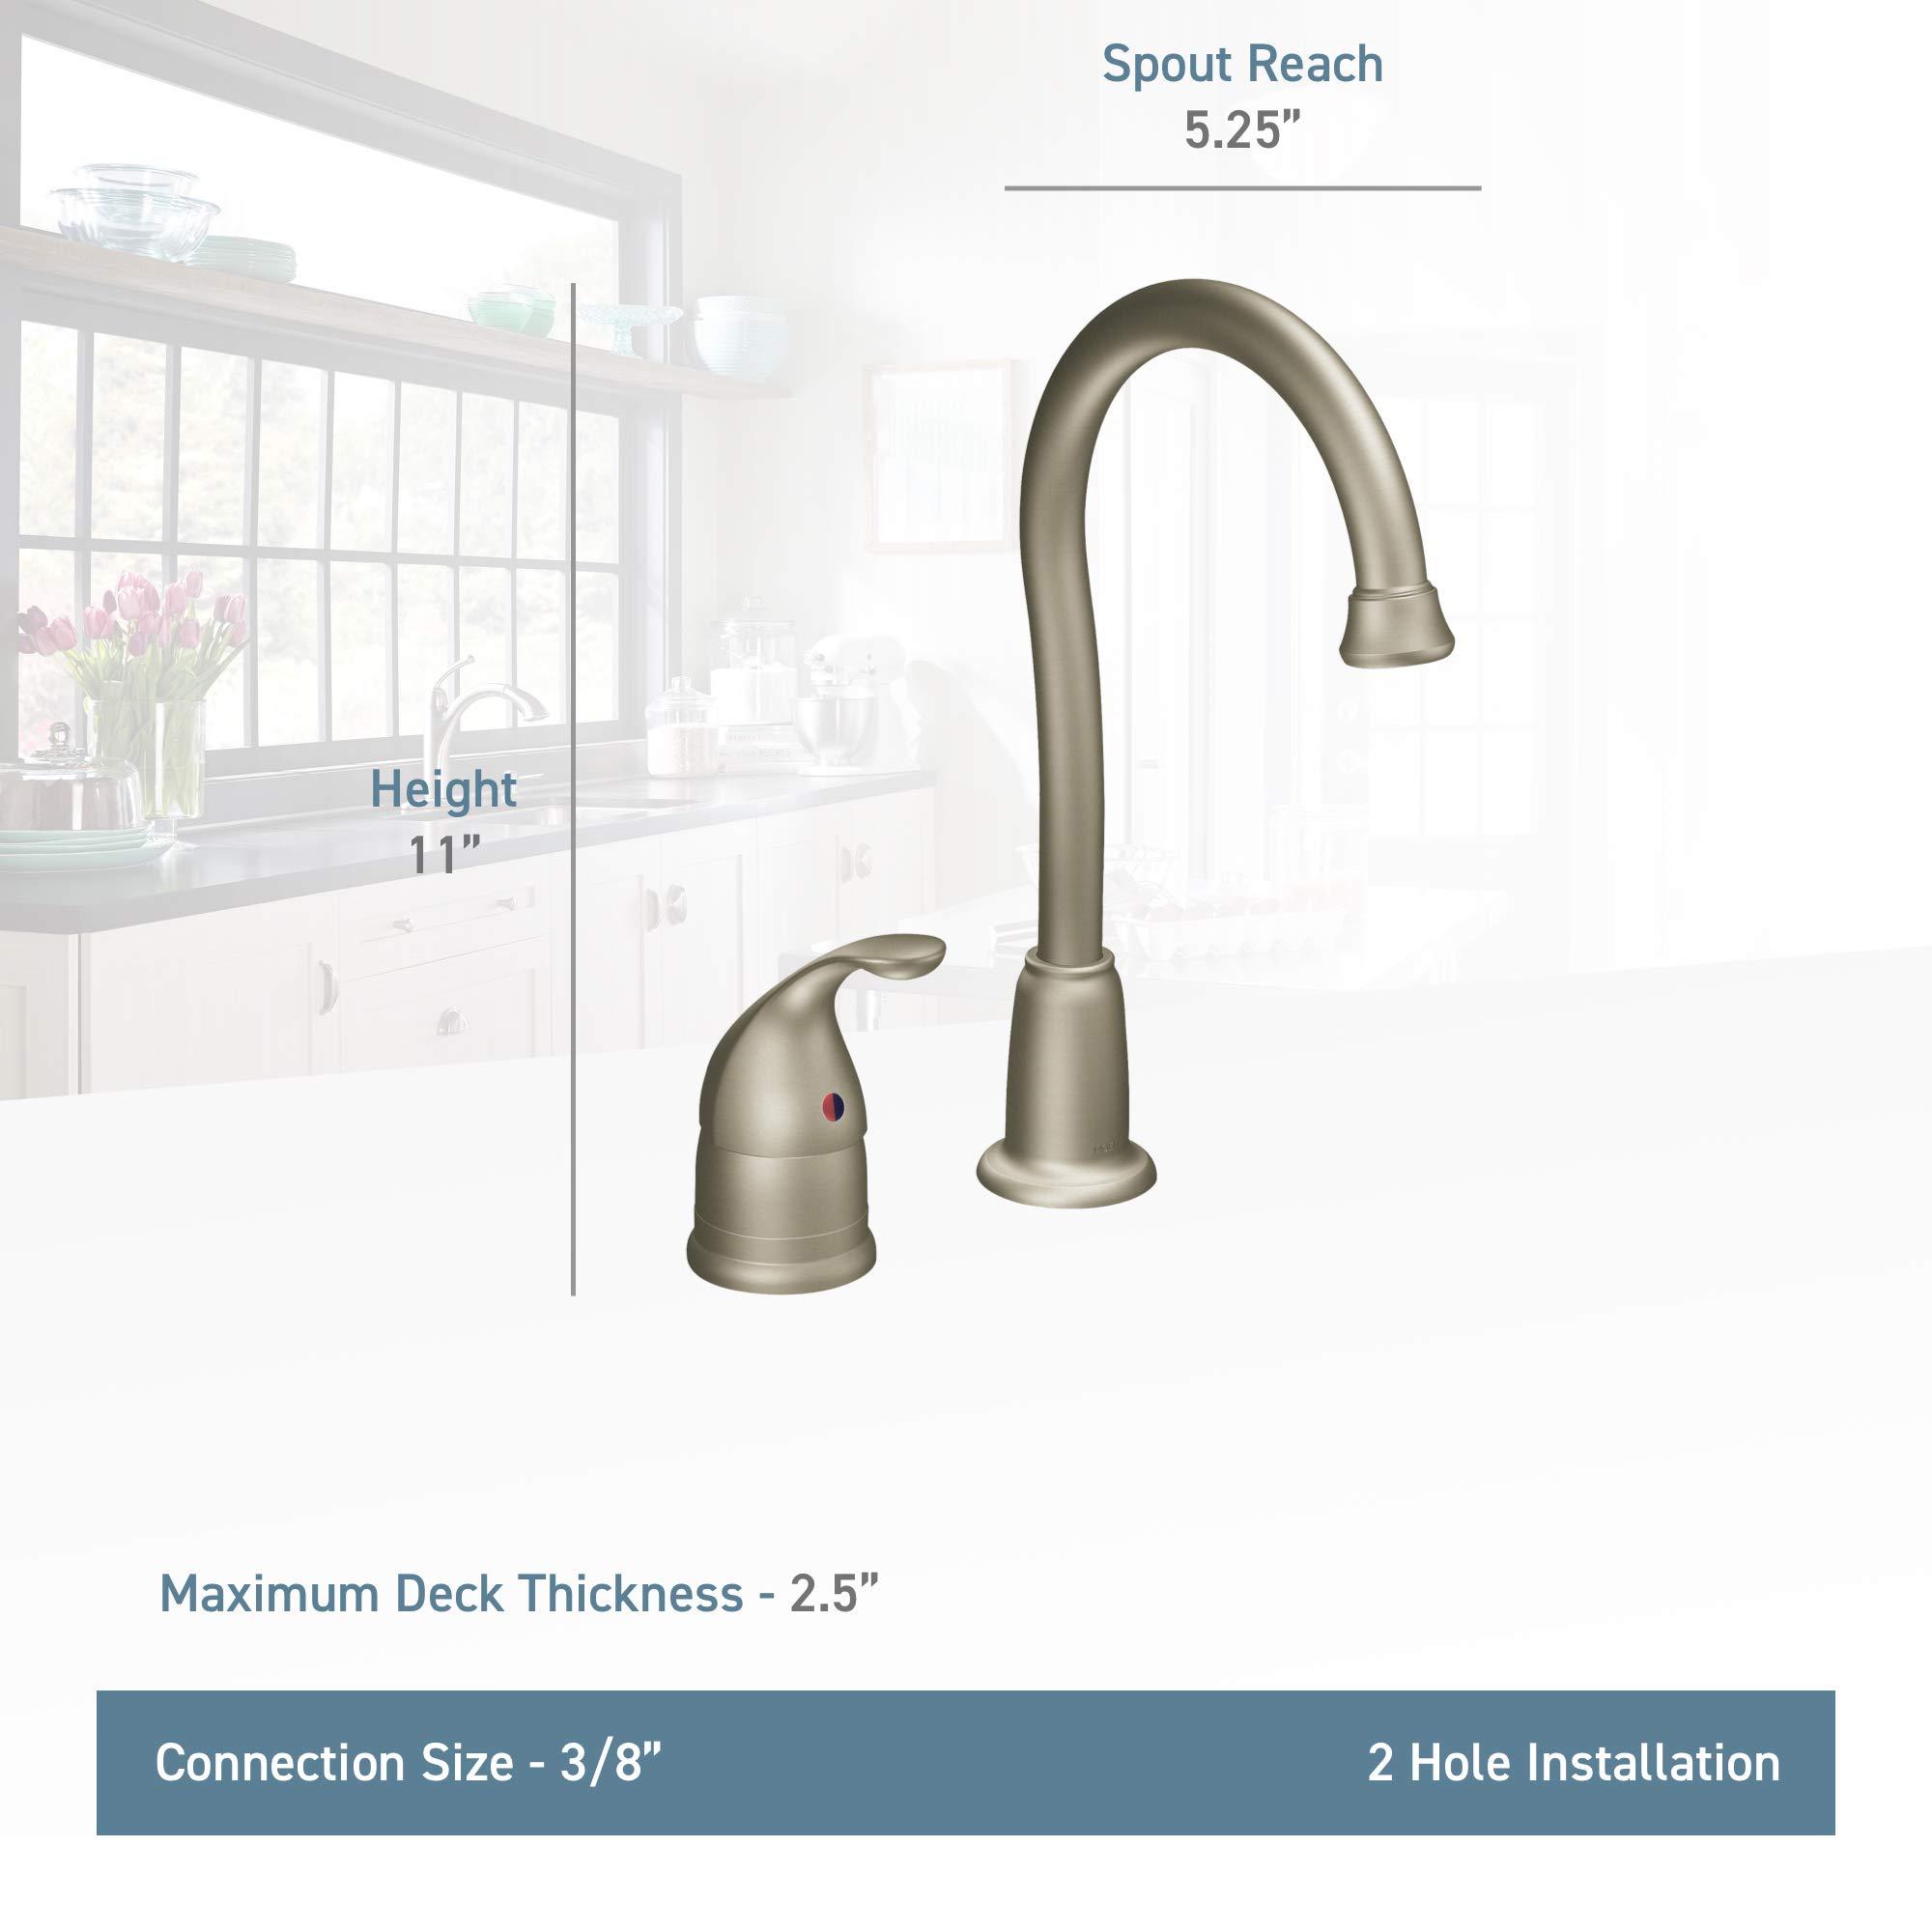 Moen 4905 Camerist One-Handle High Arc Bar Faucet, Chrome